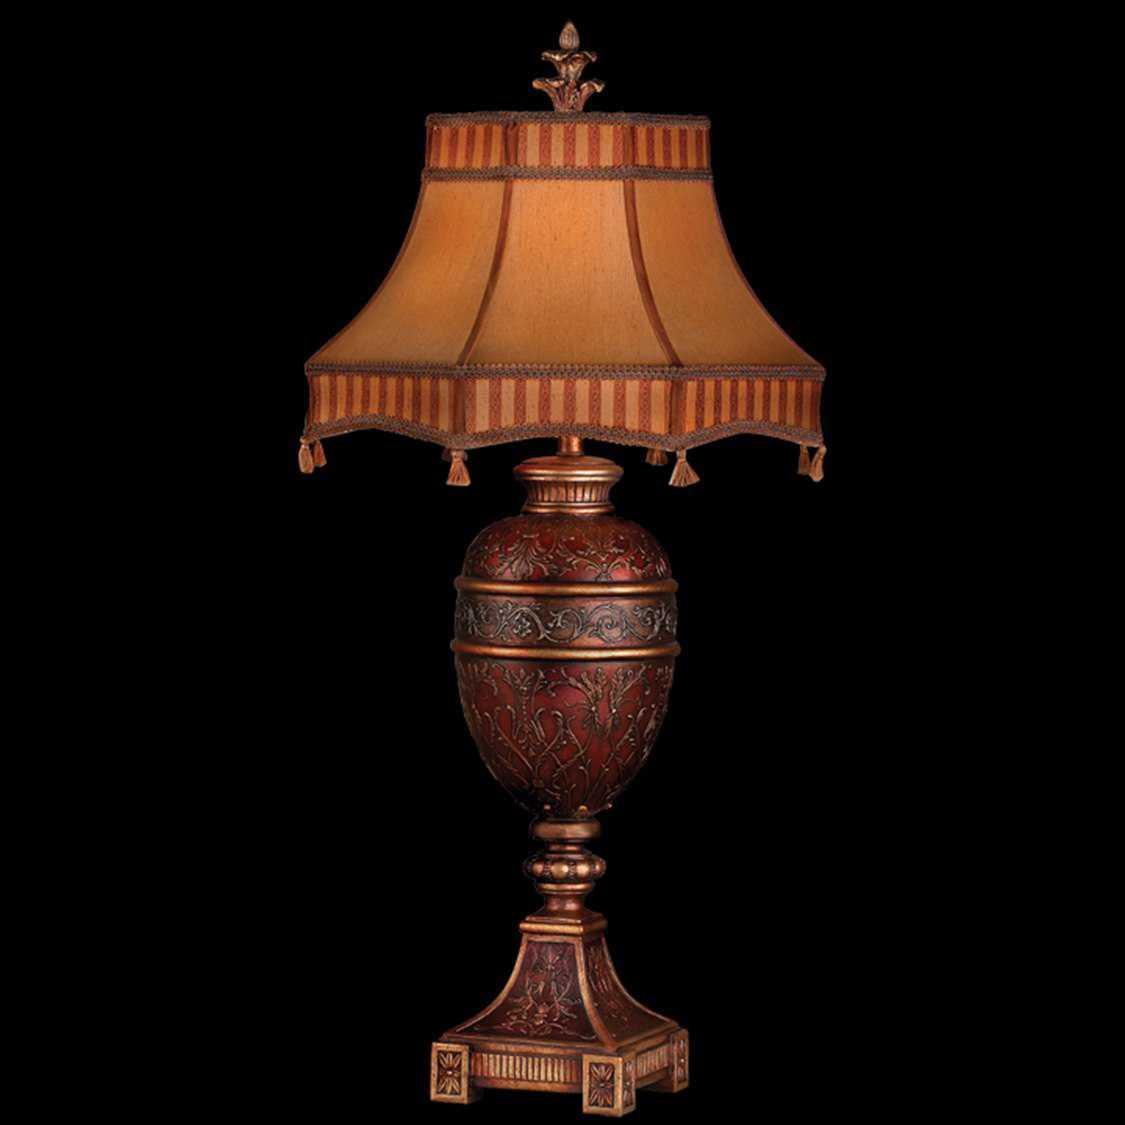 fine art lamps brighton pavillion 305010st table lamp. Black Bedroom Furniture Sets. Home Design Ideas